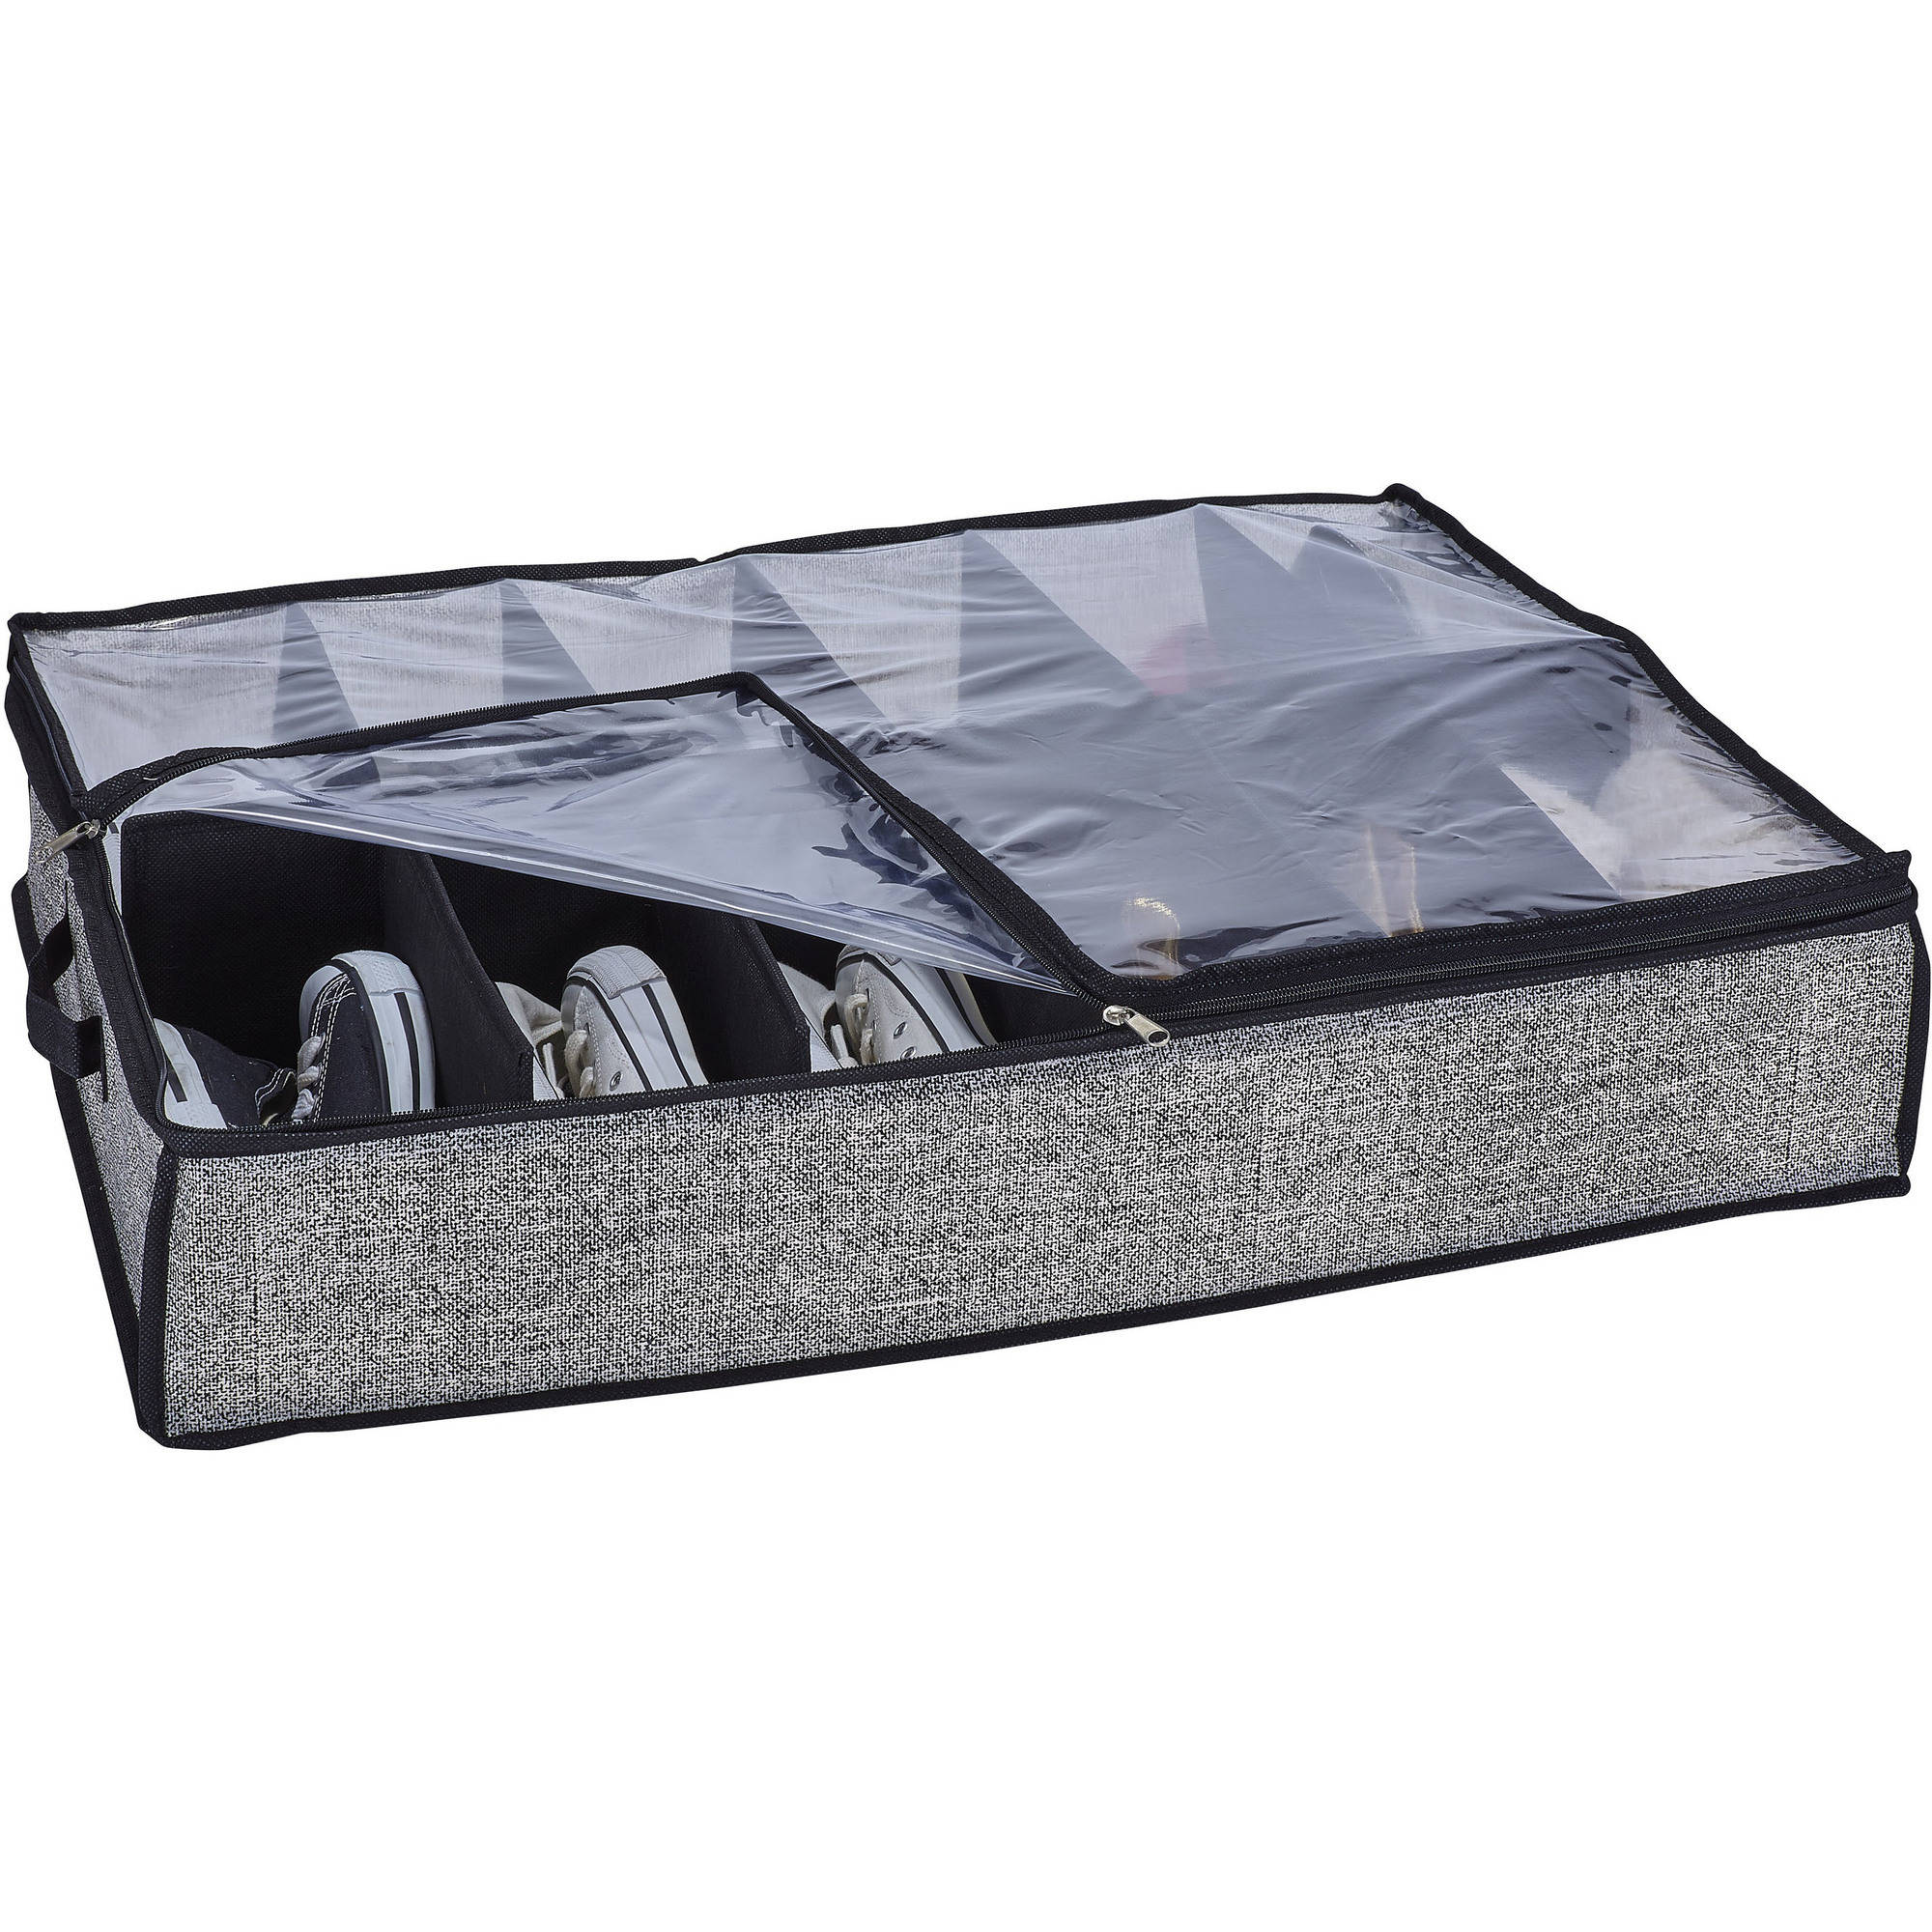 Simplify 12-Pair Under-the-Bed Storage Box, Black